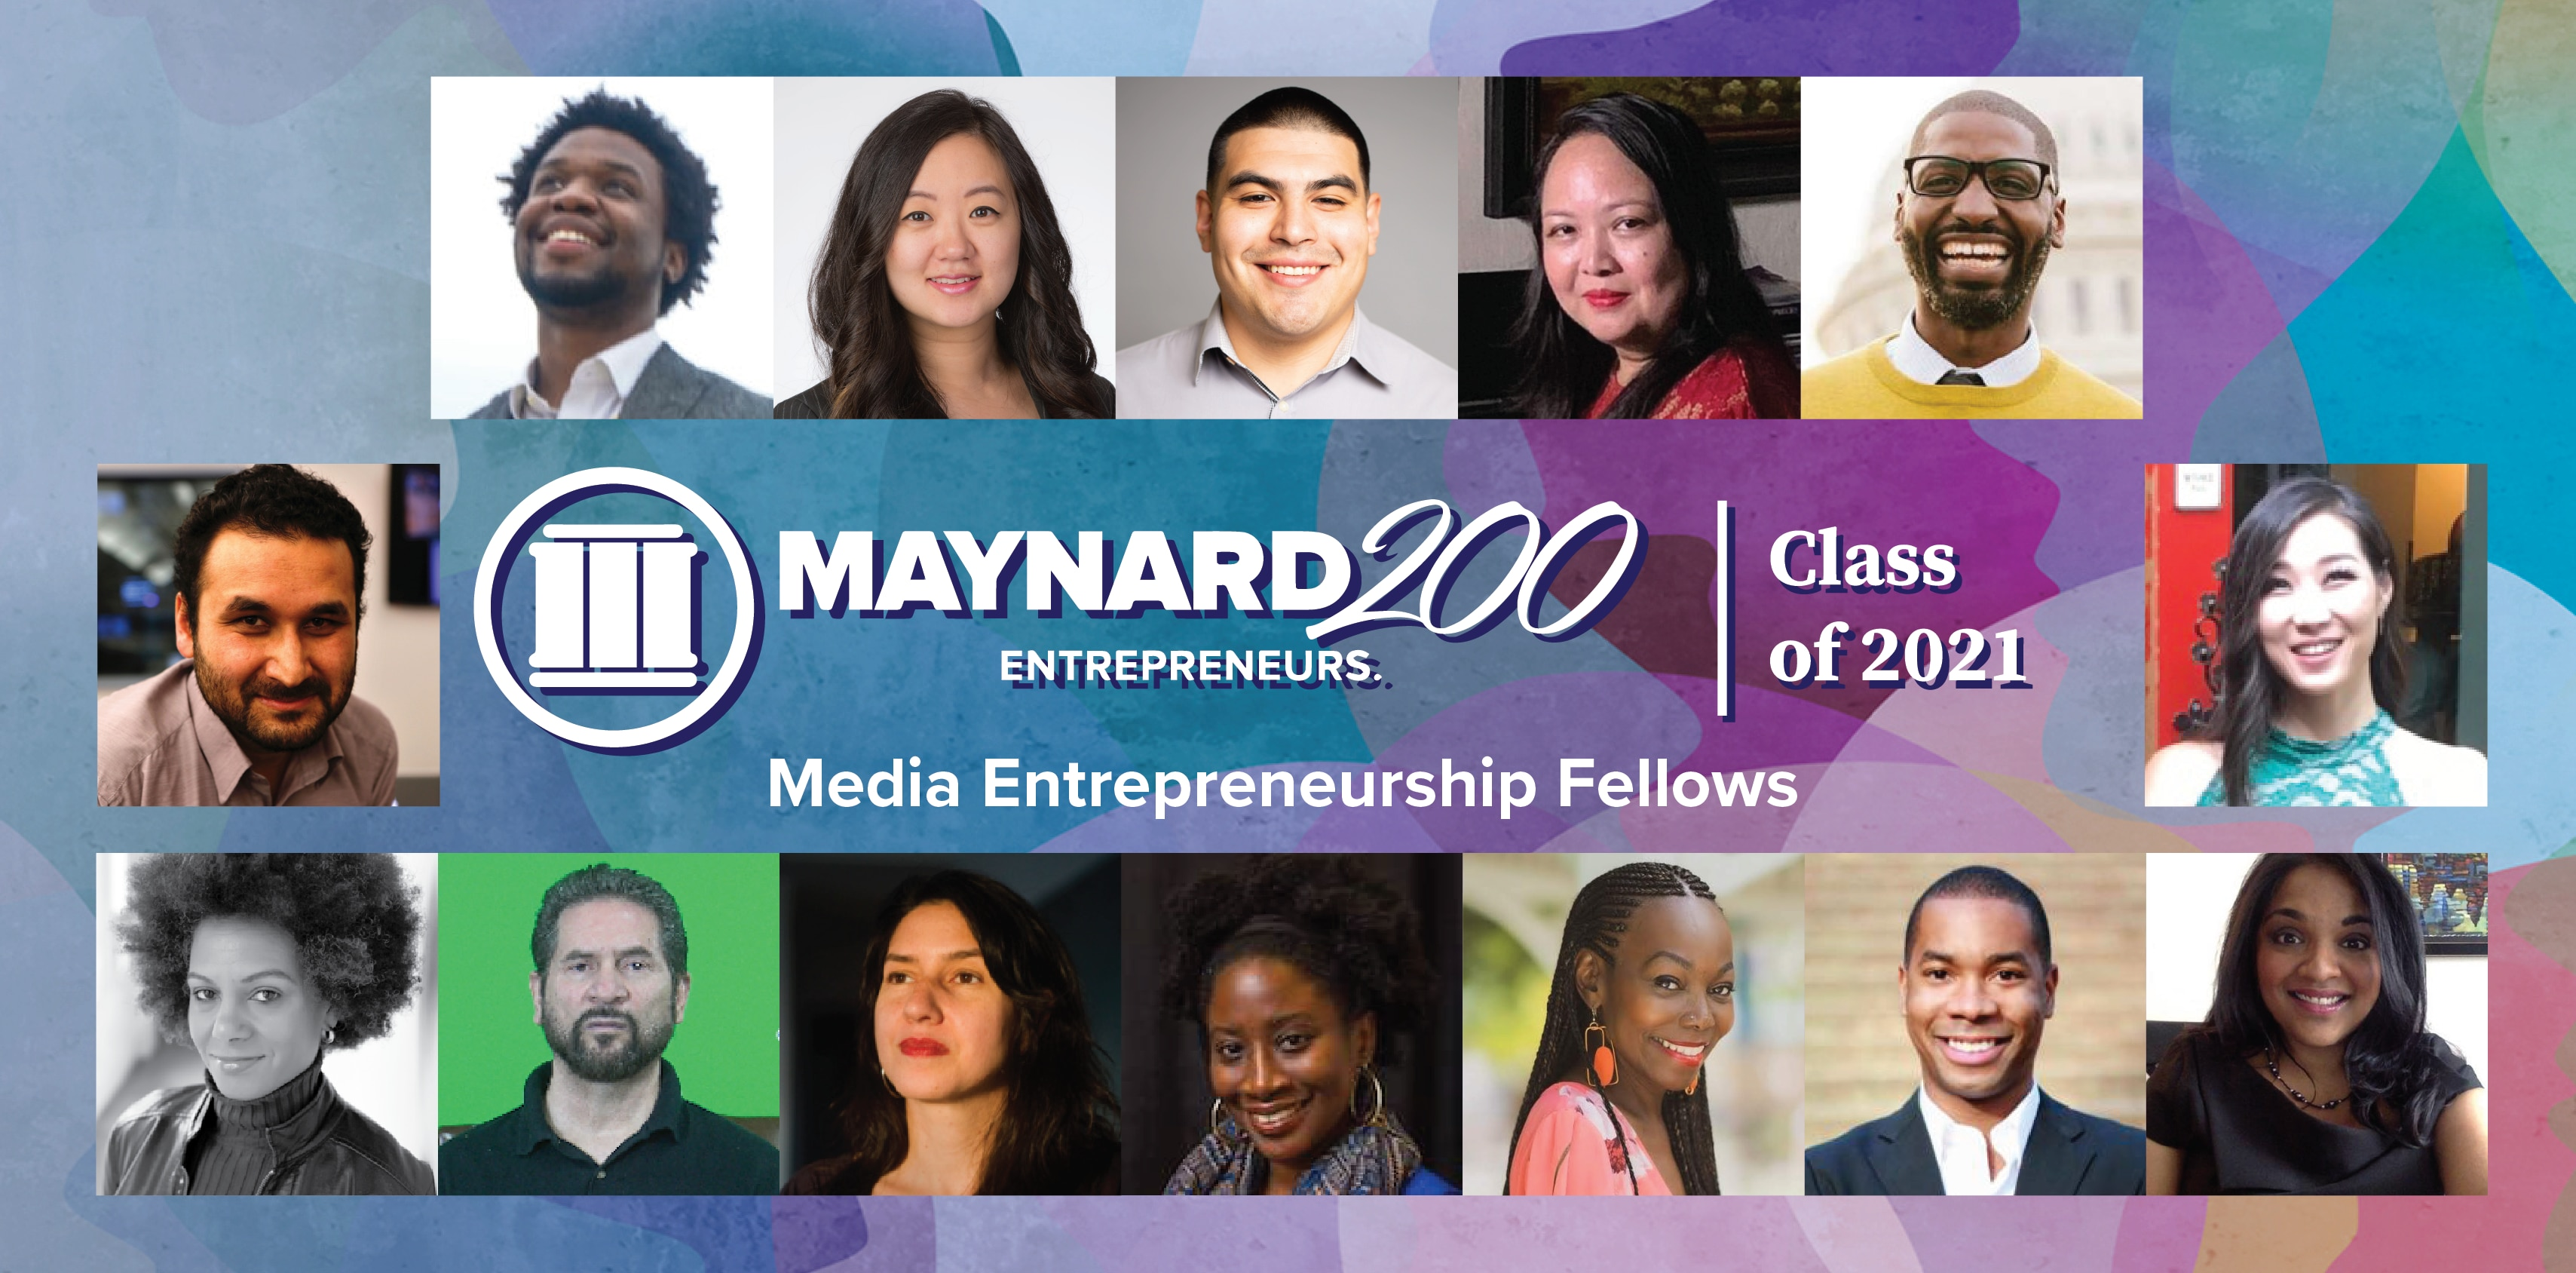 Media Entrepreneurship Fellows